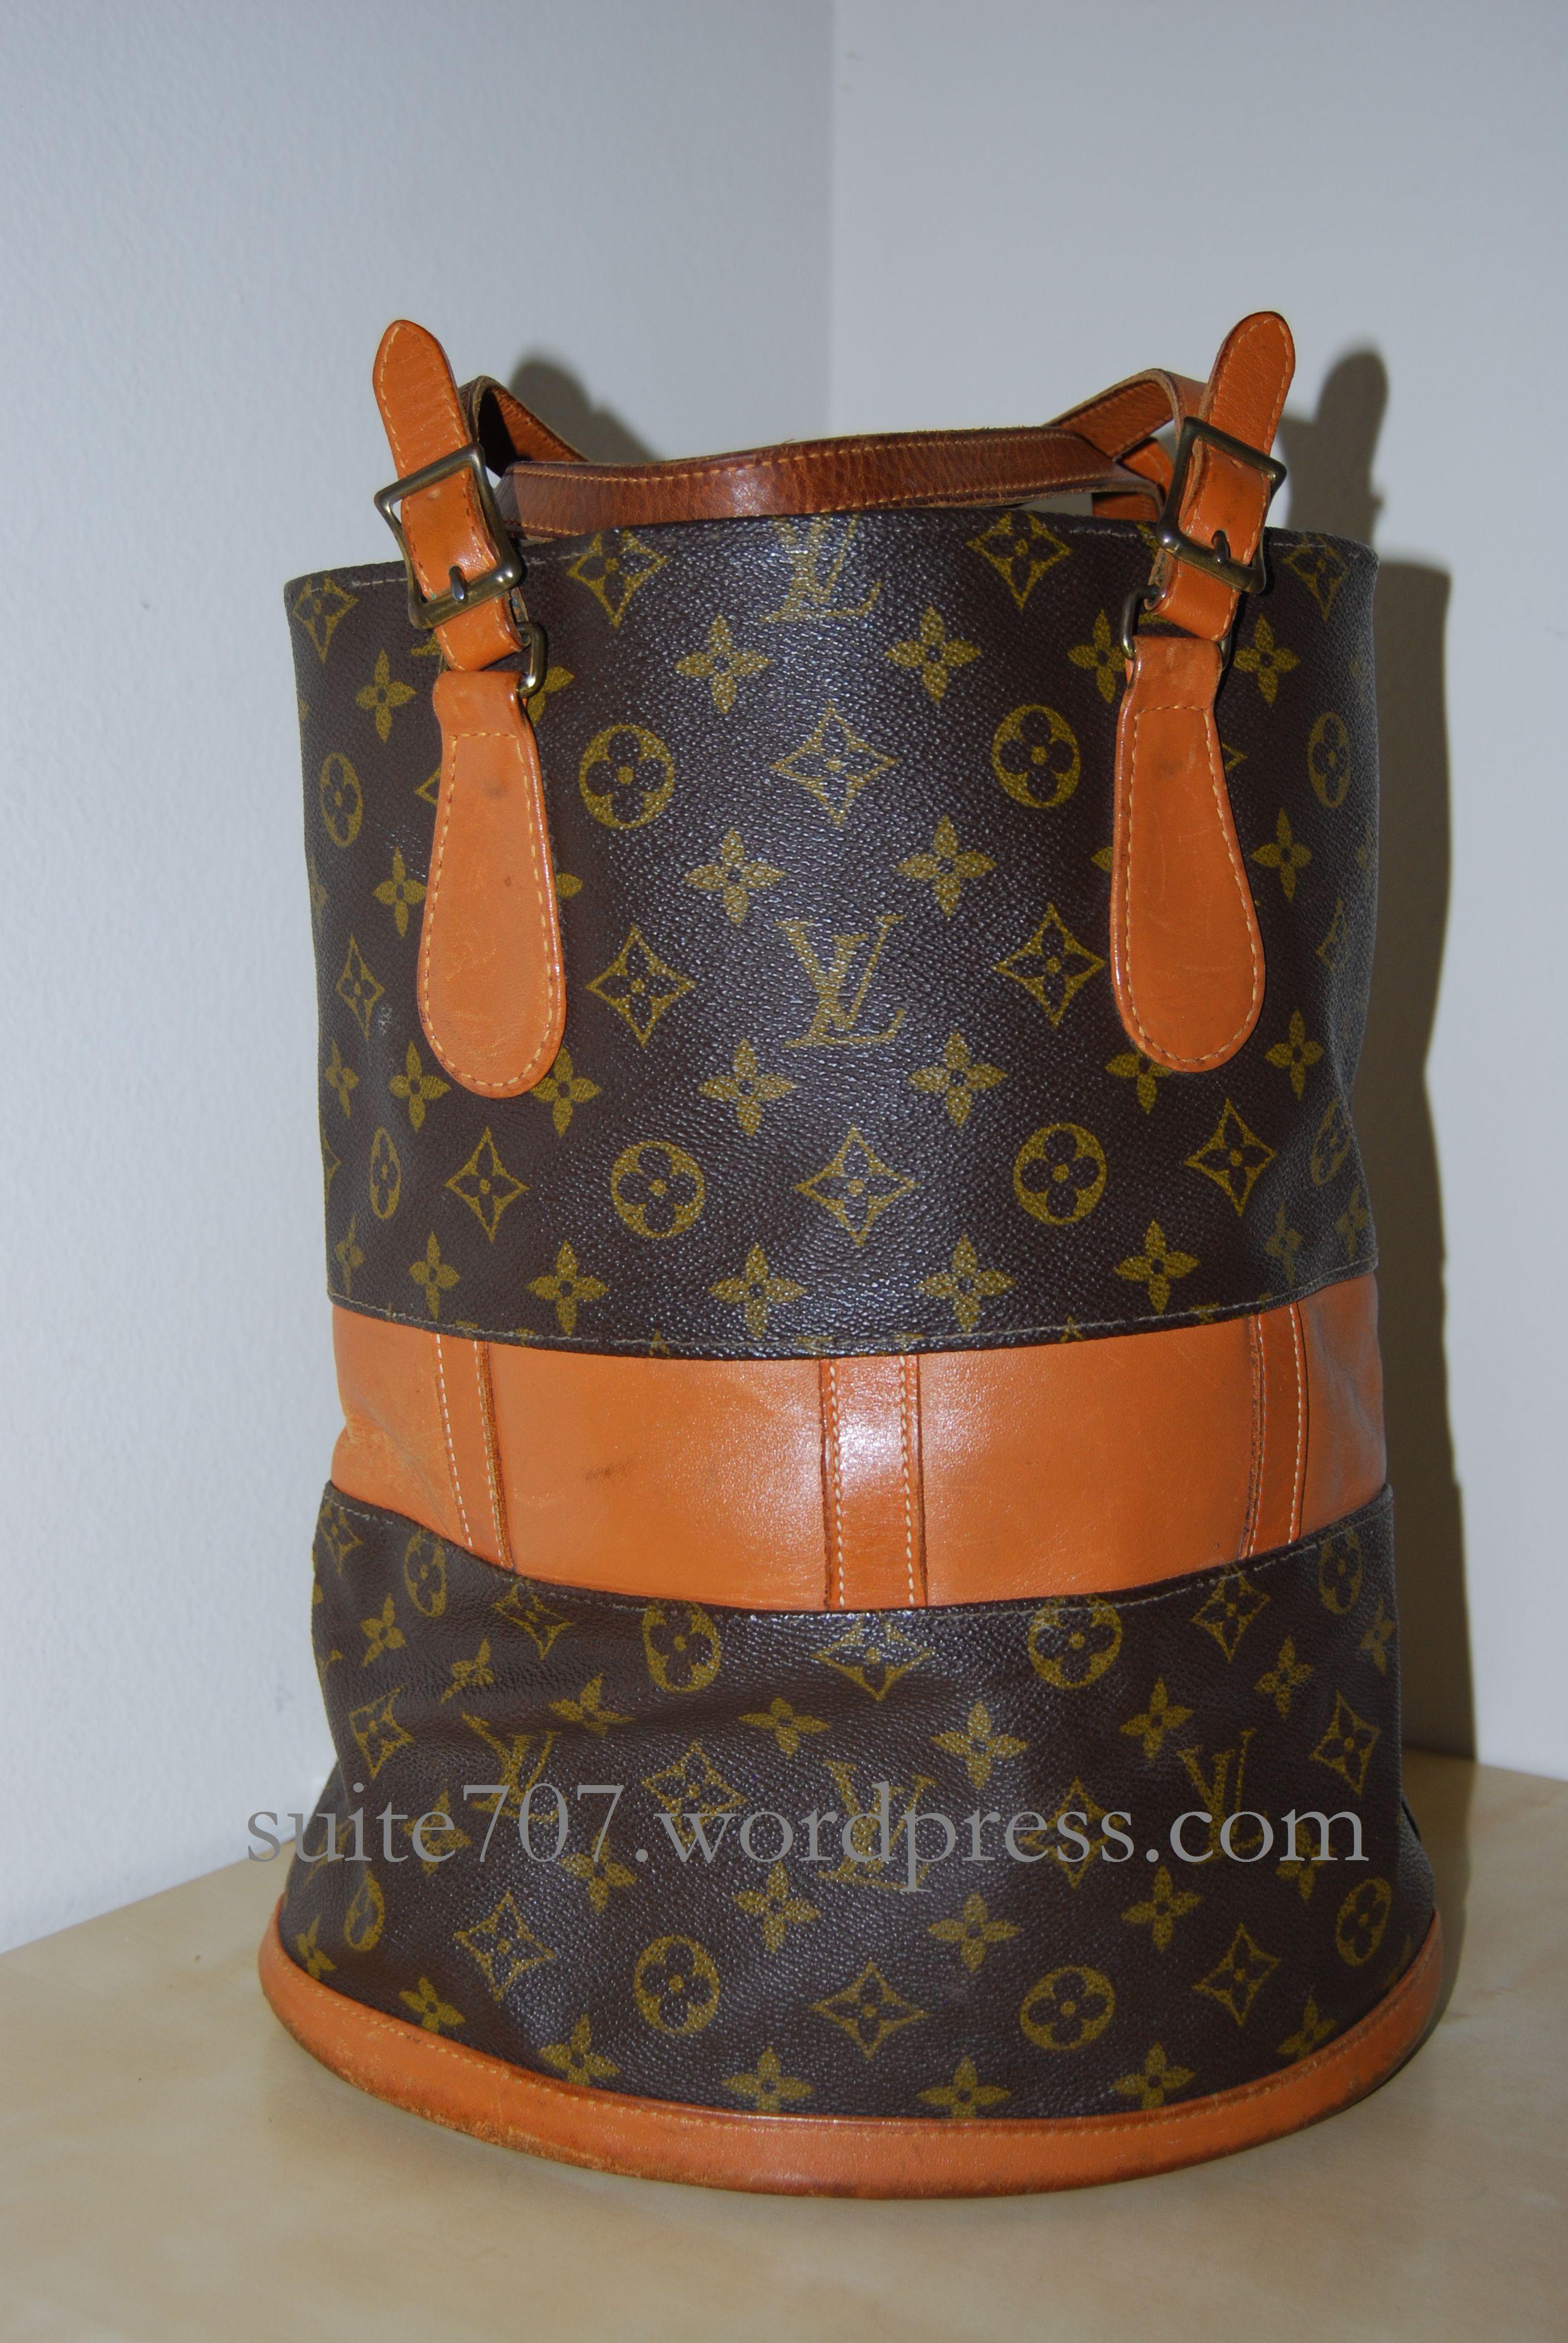 Louis-Vuitton-Vintage-Bucket-Bag